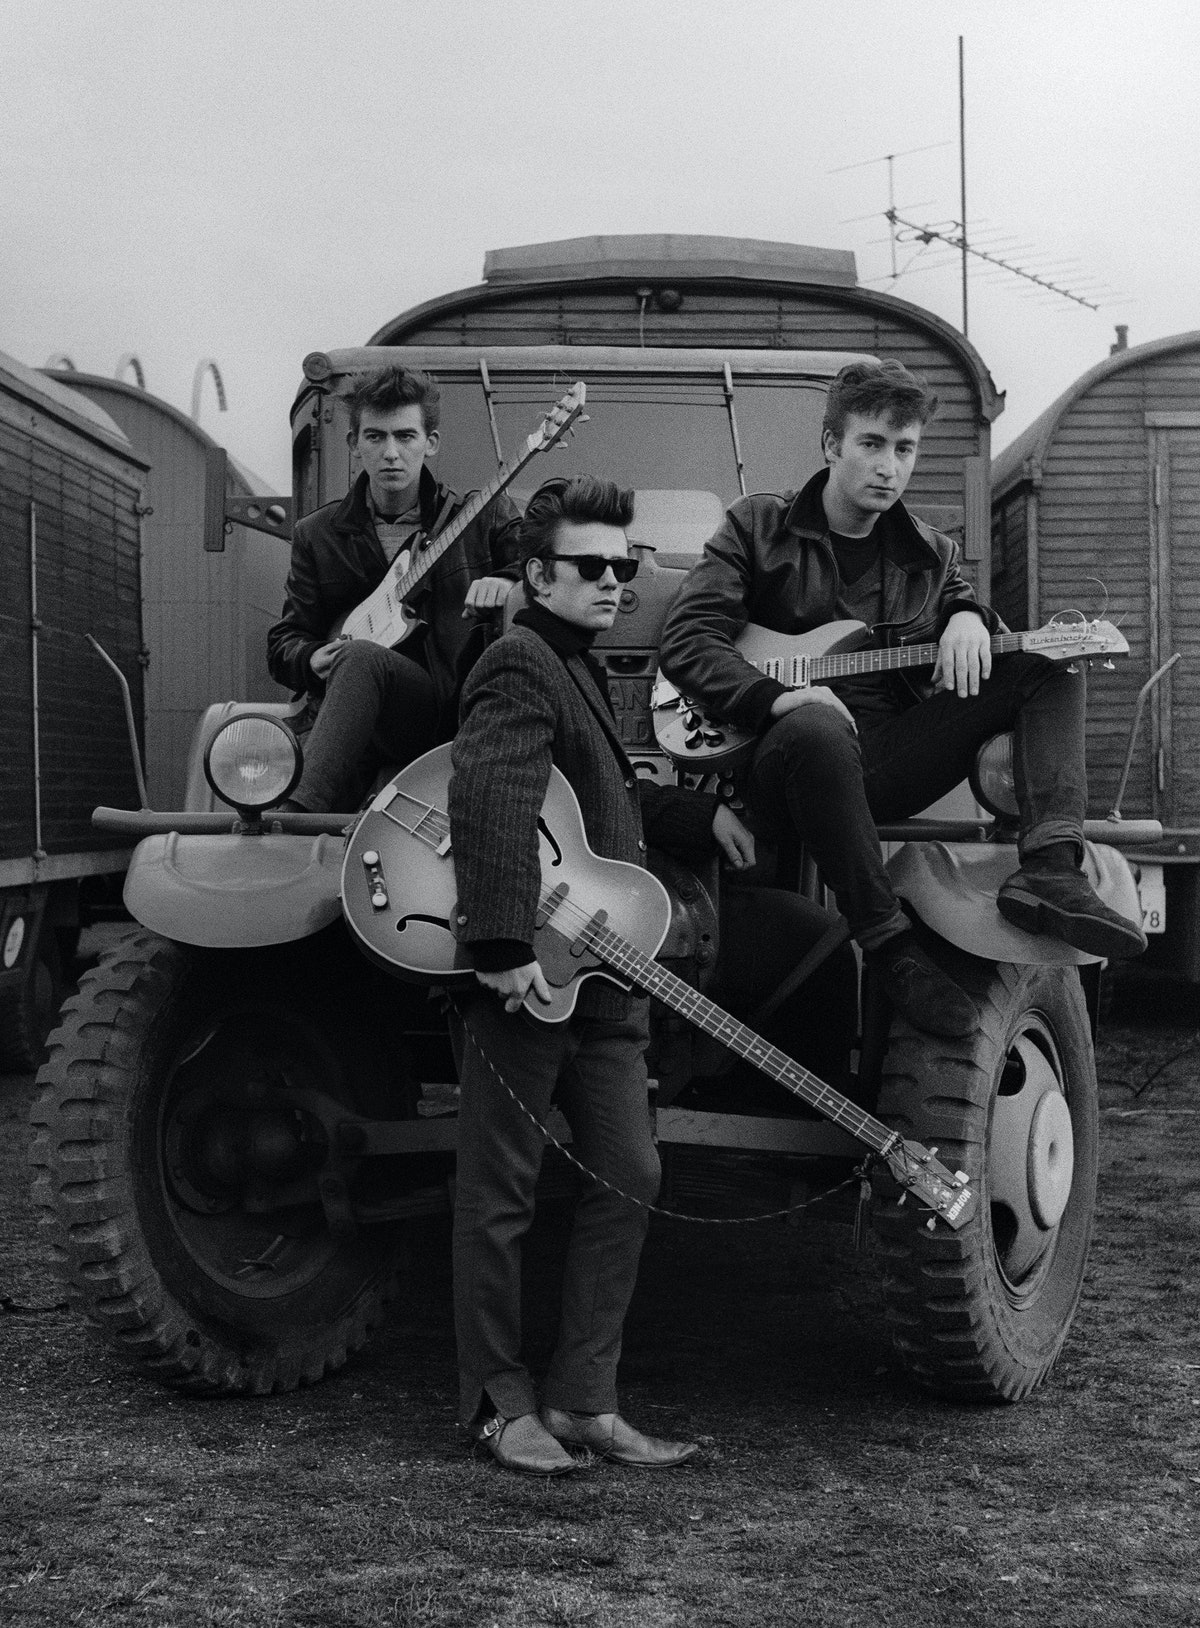 Astrid_Kirchherr_John_Lennon_Stuart_Sutcliffe_and_George_Harrison_on_a_truck_at_the_Fairground_1960_HR.jpg